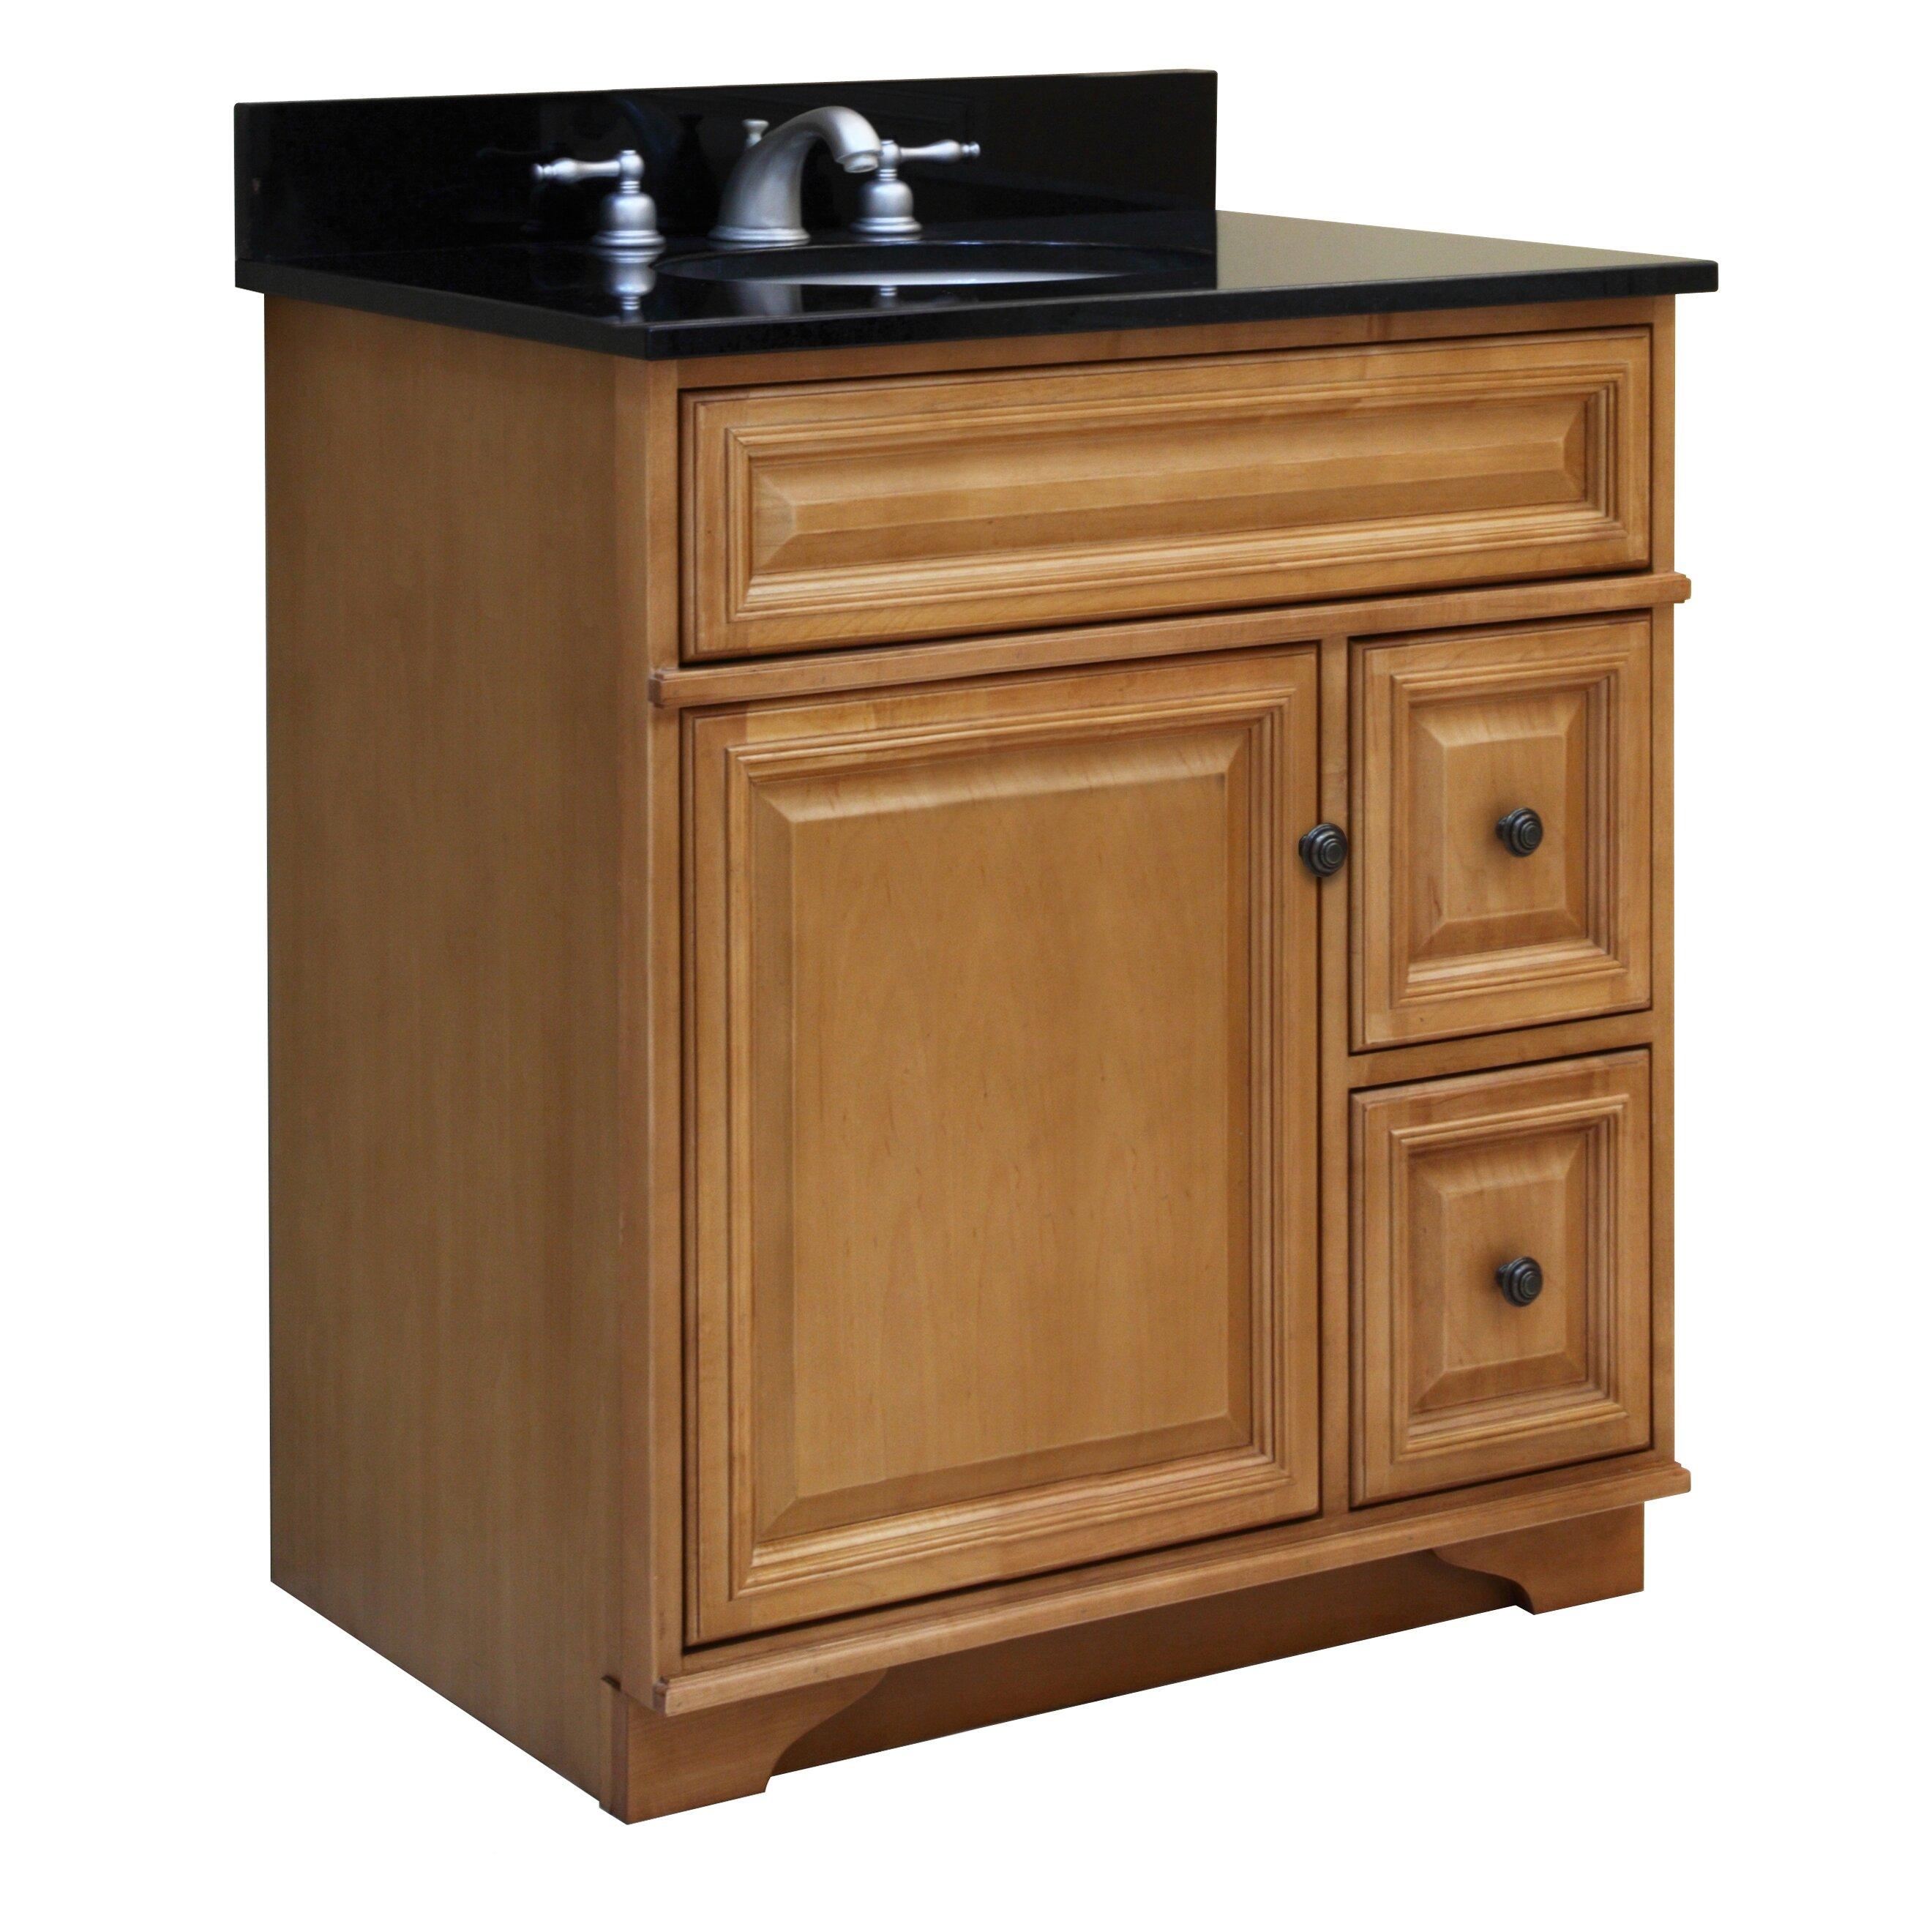 Sunnywood Kitchen Cabinets Sunnywood Cabinets  Bar Cabinet